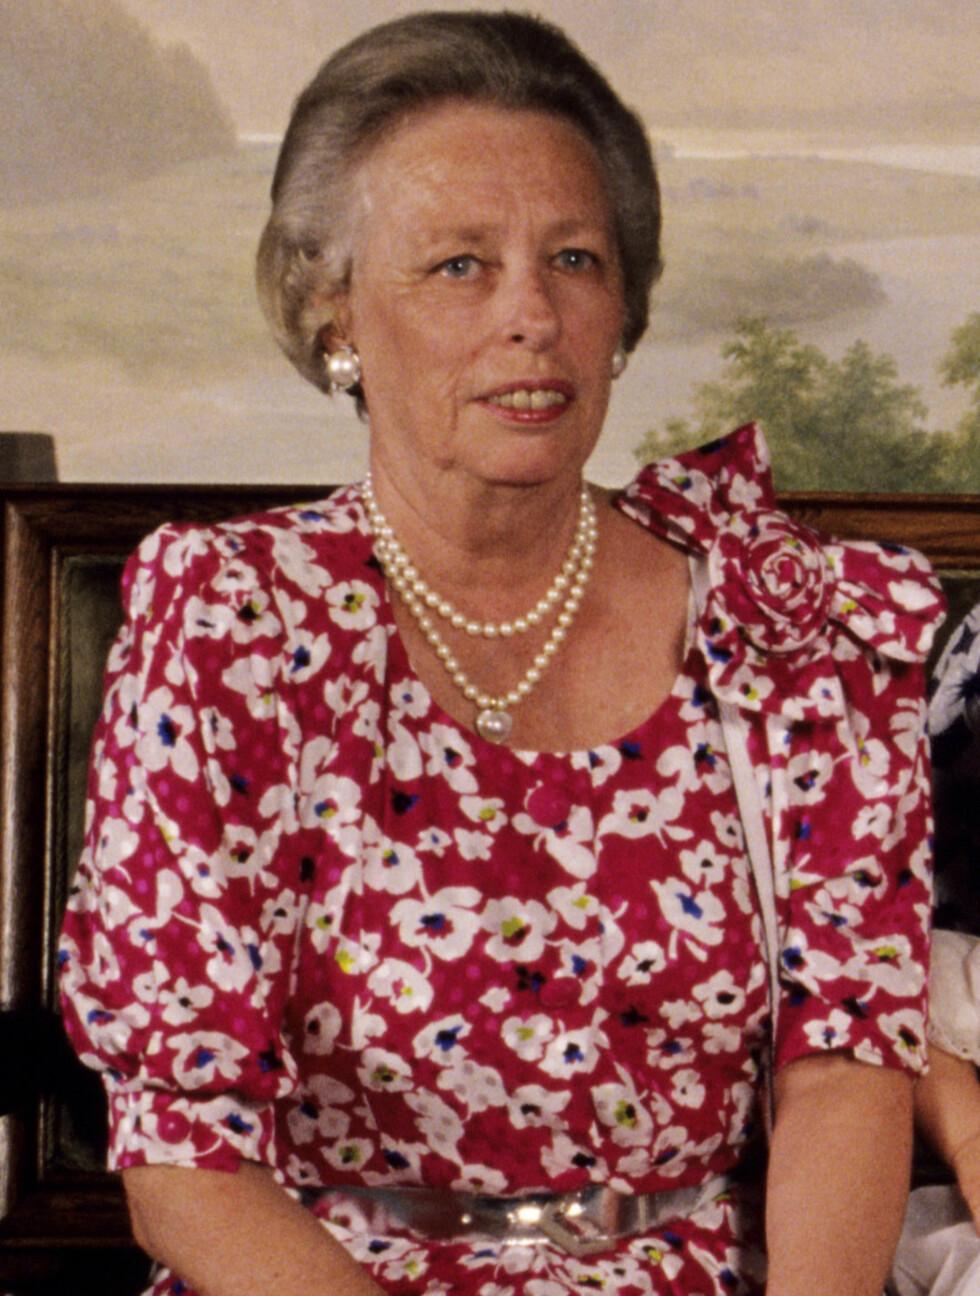 1989: Prinsesse Ragnhild fru Lorentzen i barnedåpen til sitt barnebarn Victoria Ragna Ribeiro.  Foto: NTB scanpix